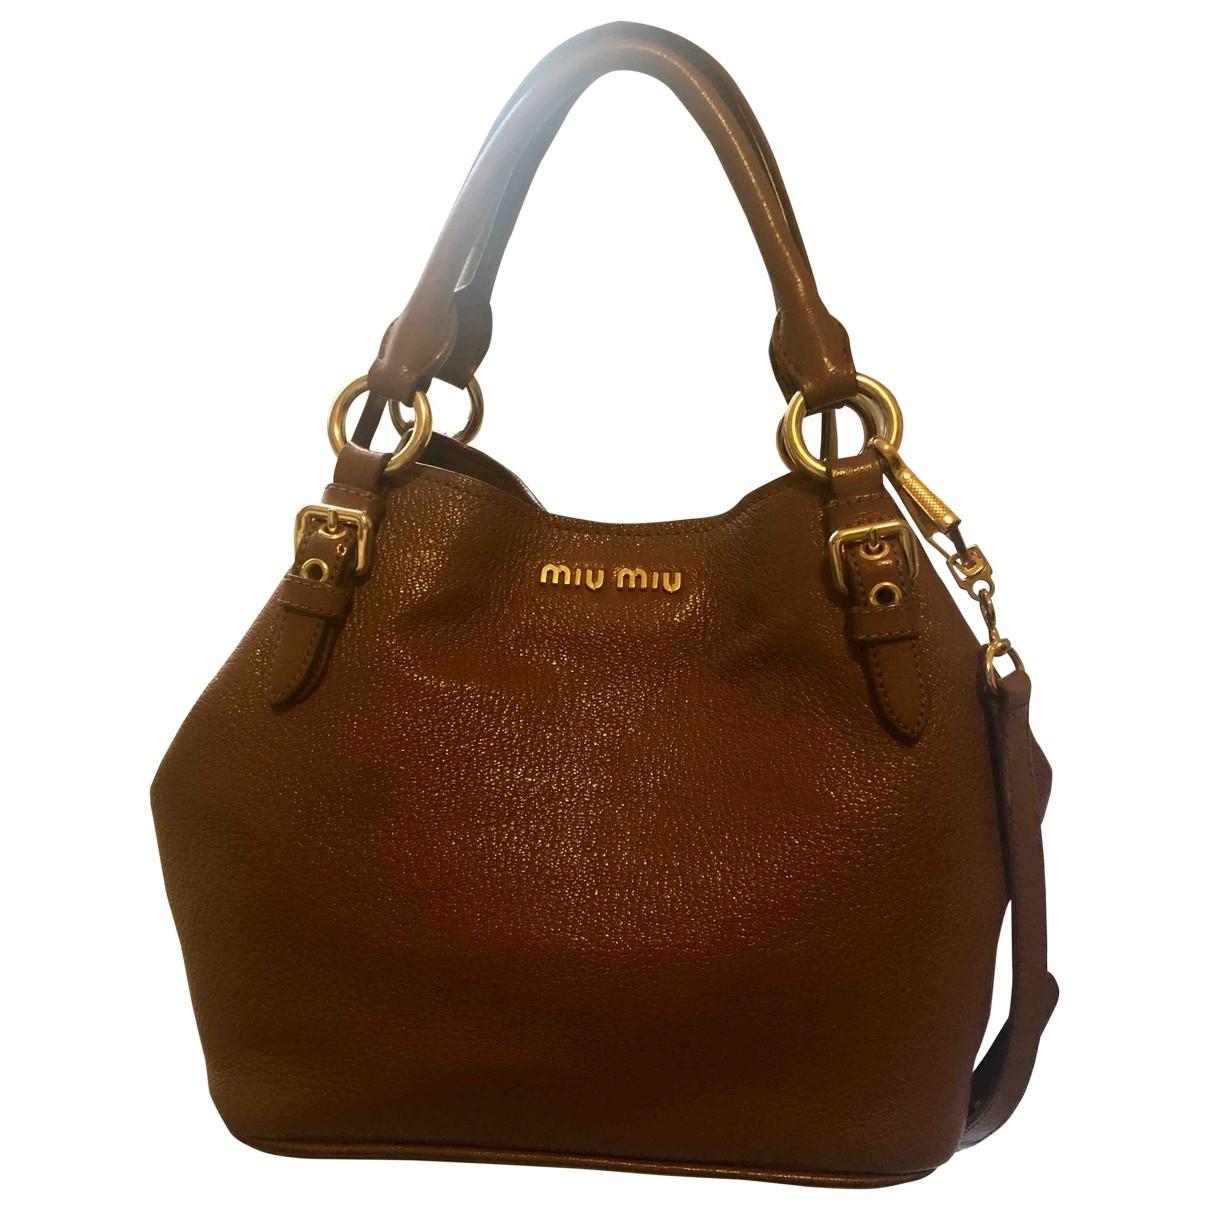 Miu Miu \N Handtasche in  Kamel Leder